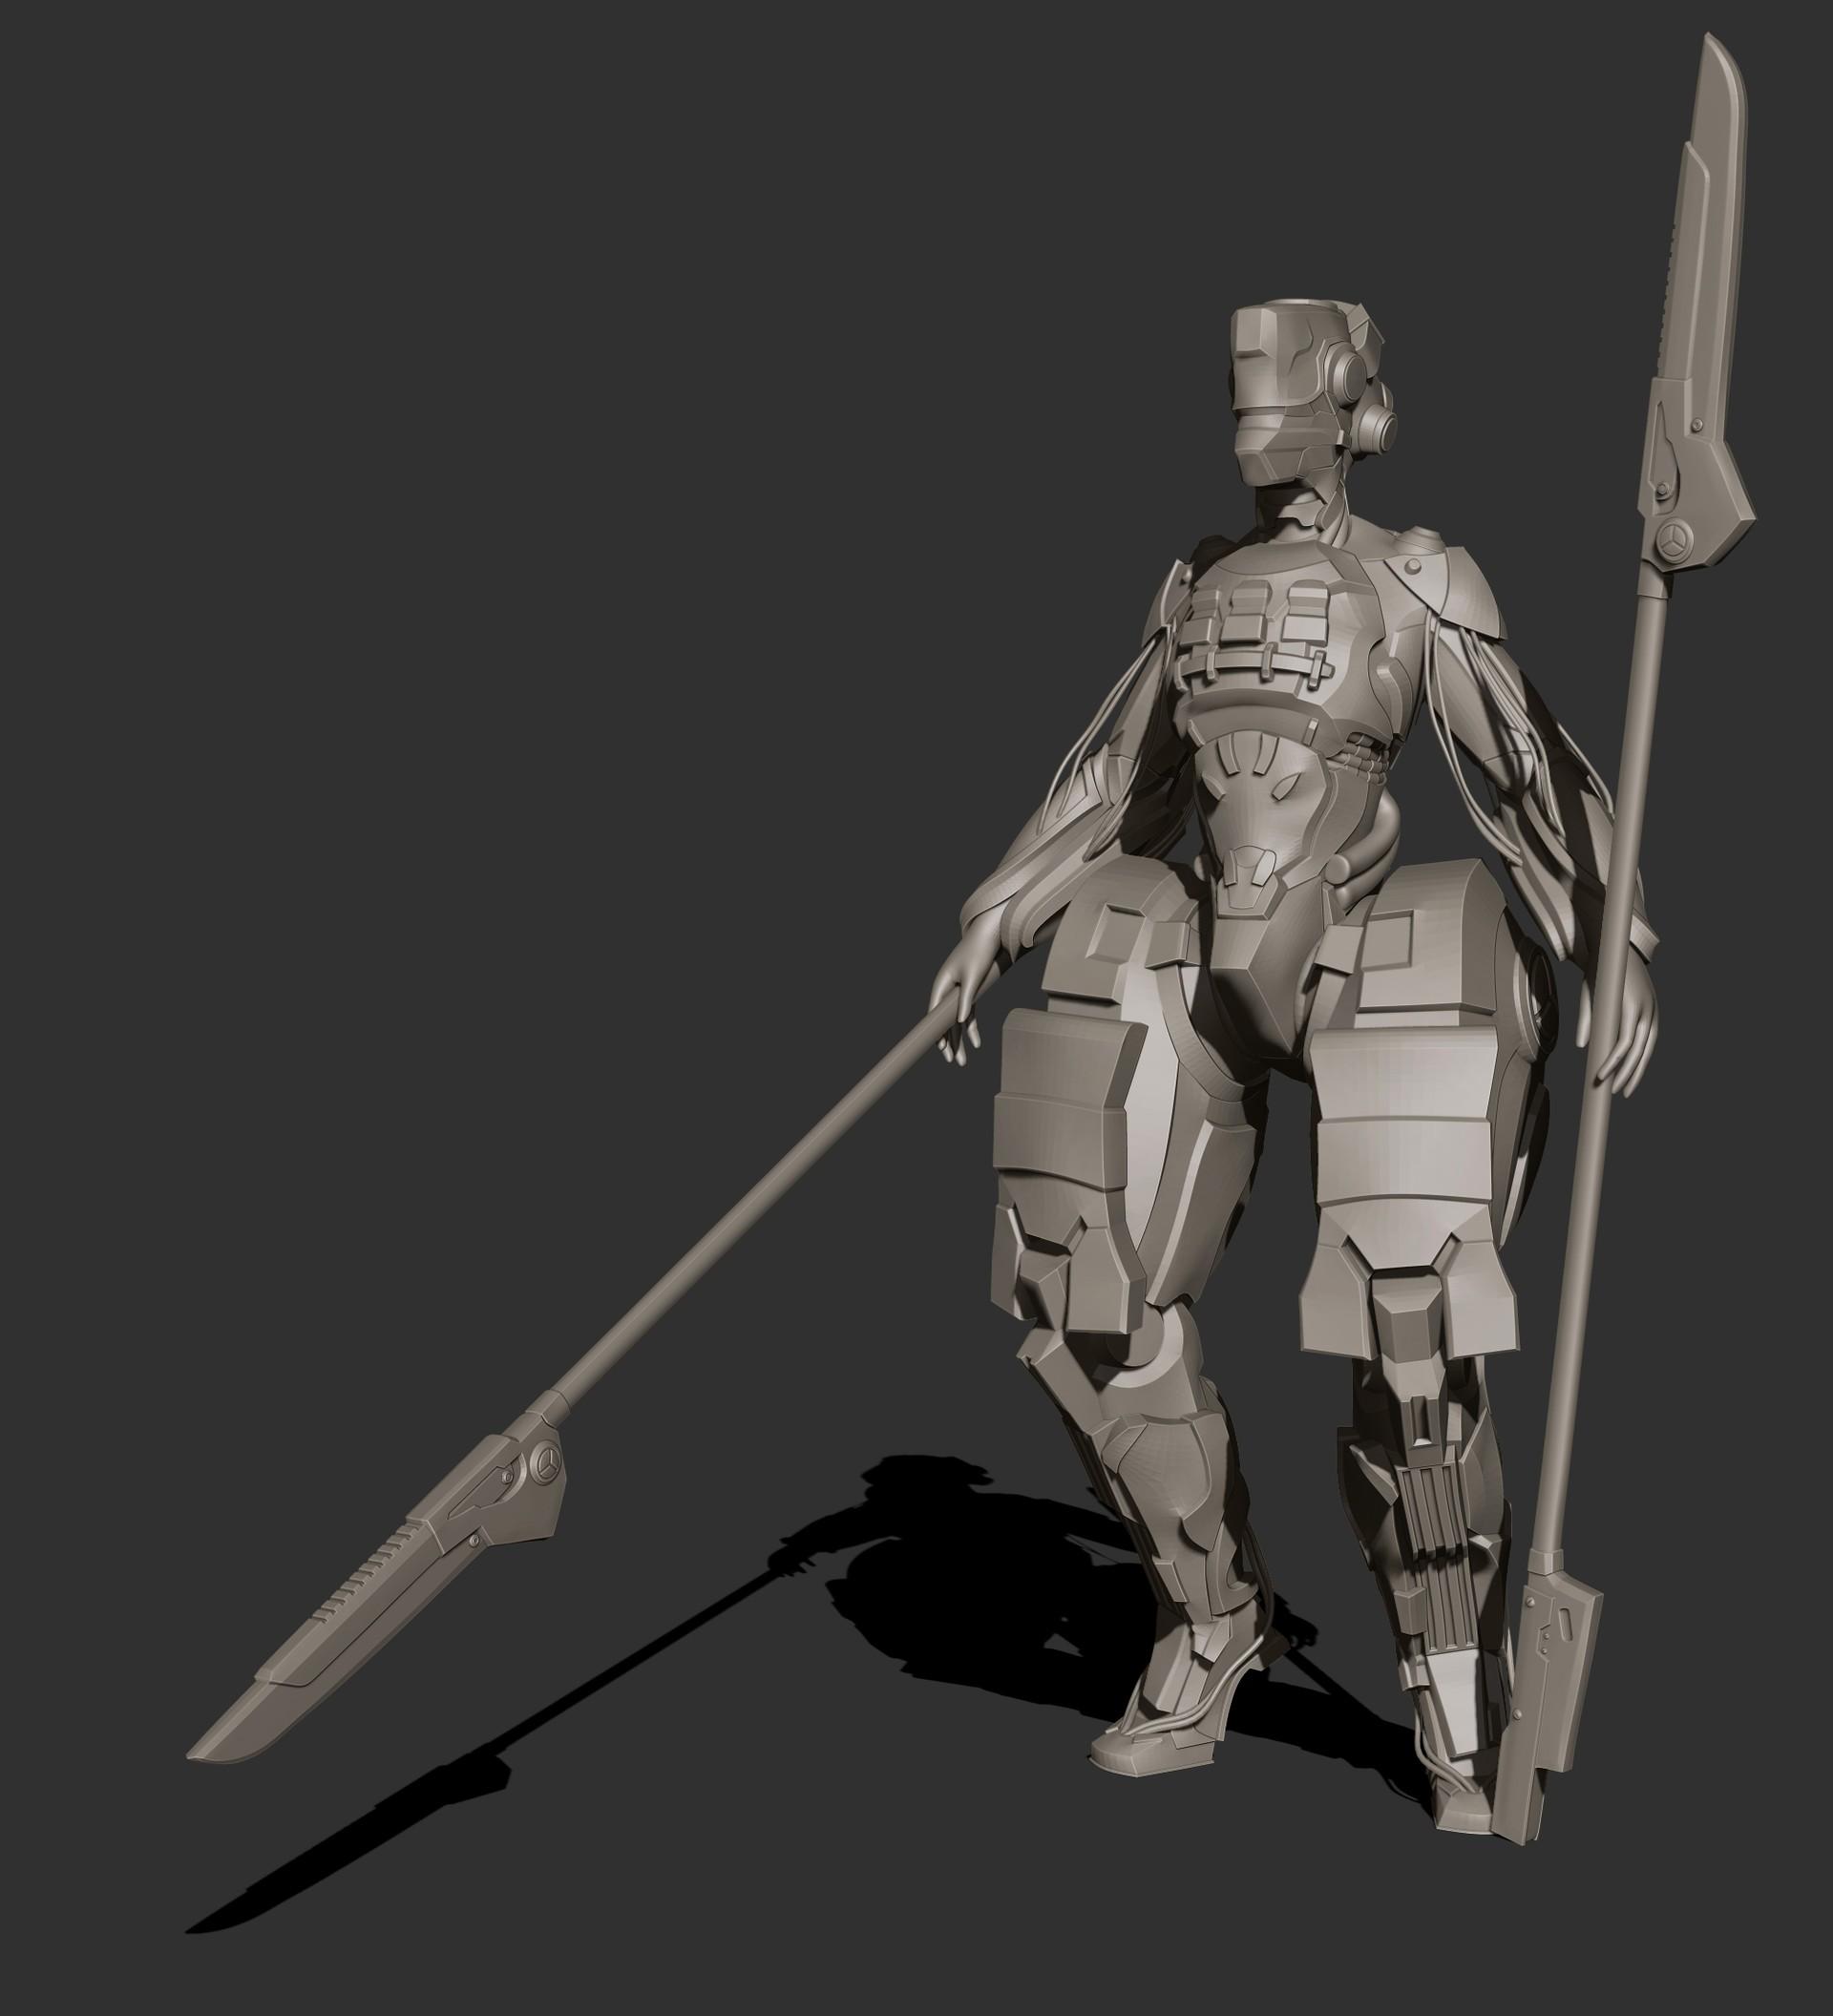 BioMech Soldier